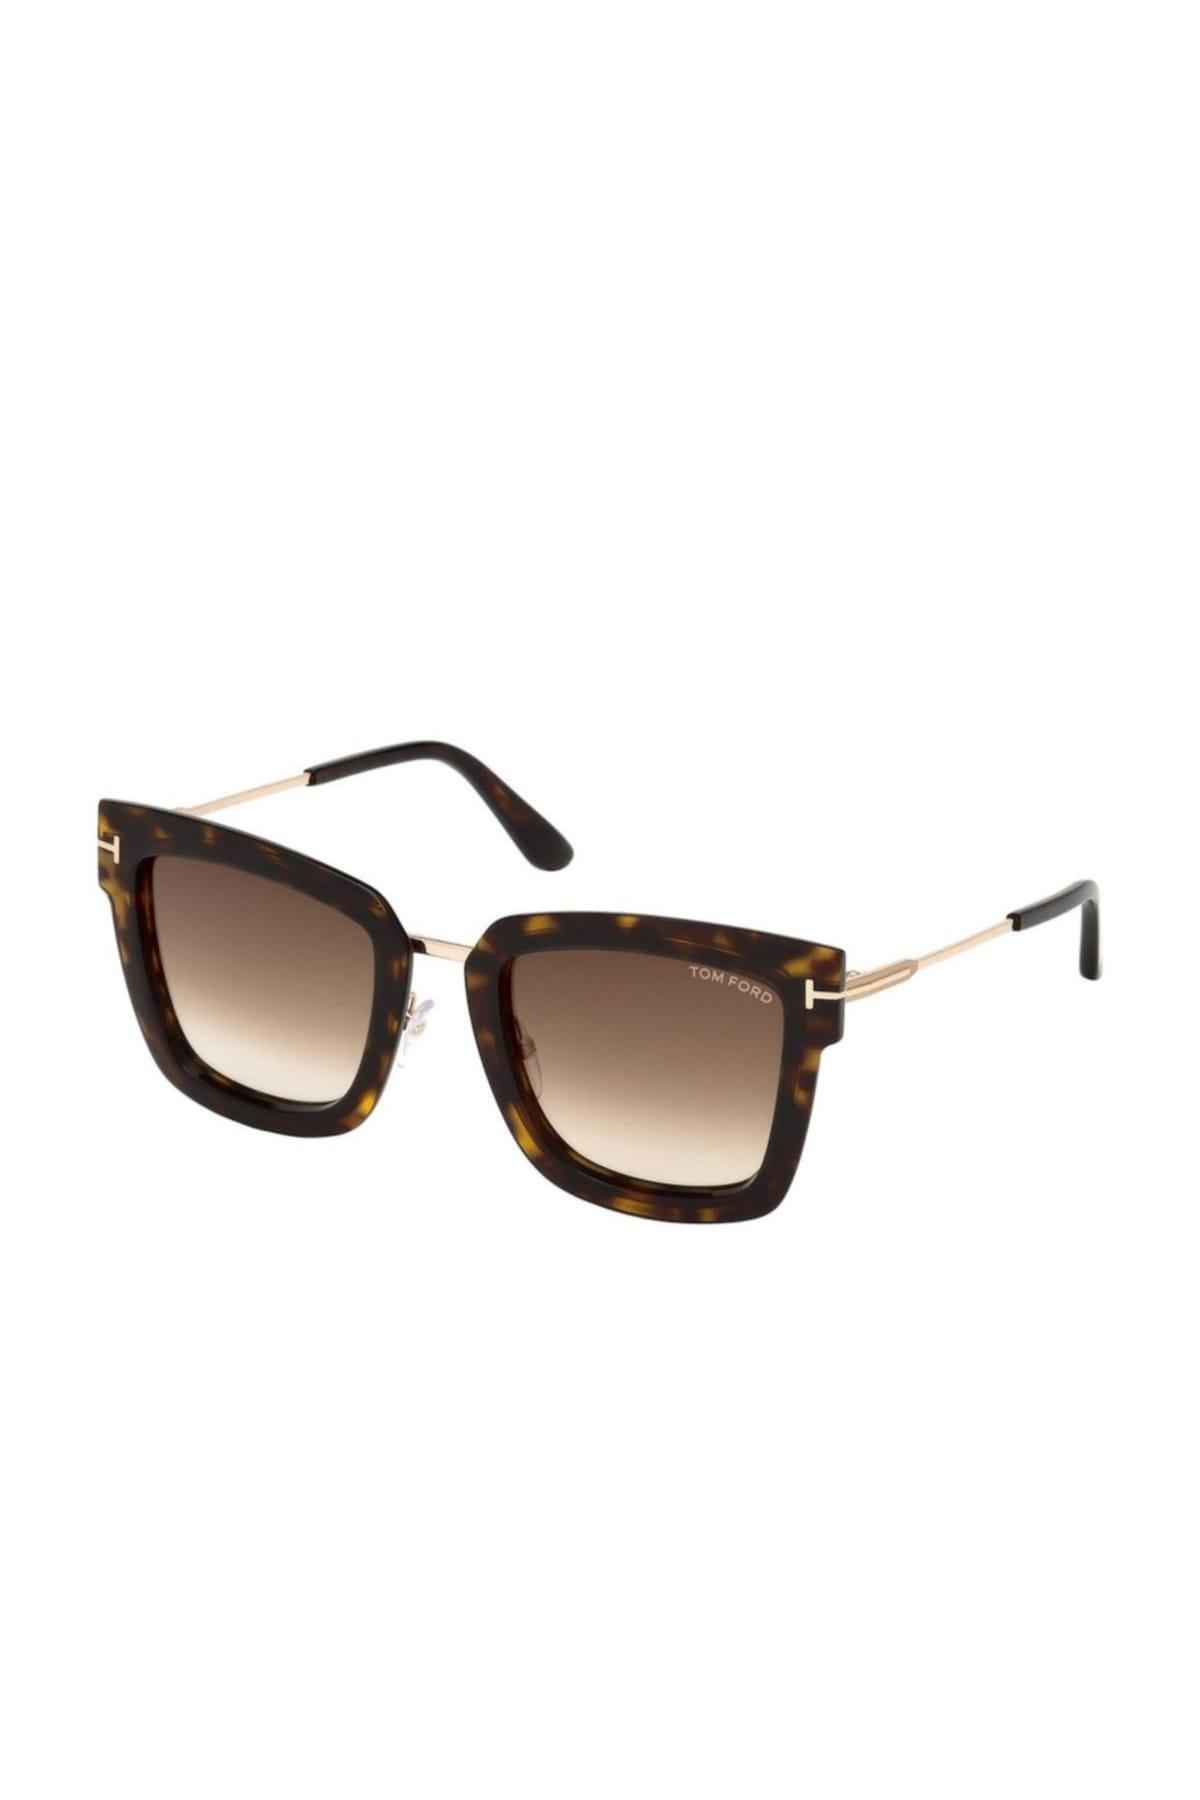 Tom Ford Kadın Güneş Gözlüğü FT0573 52F 1